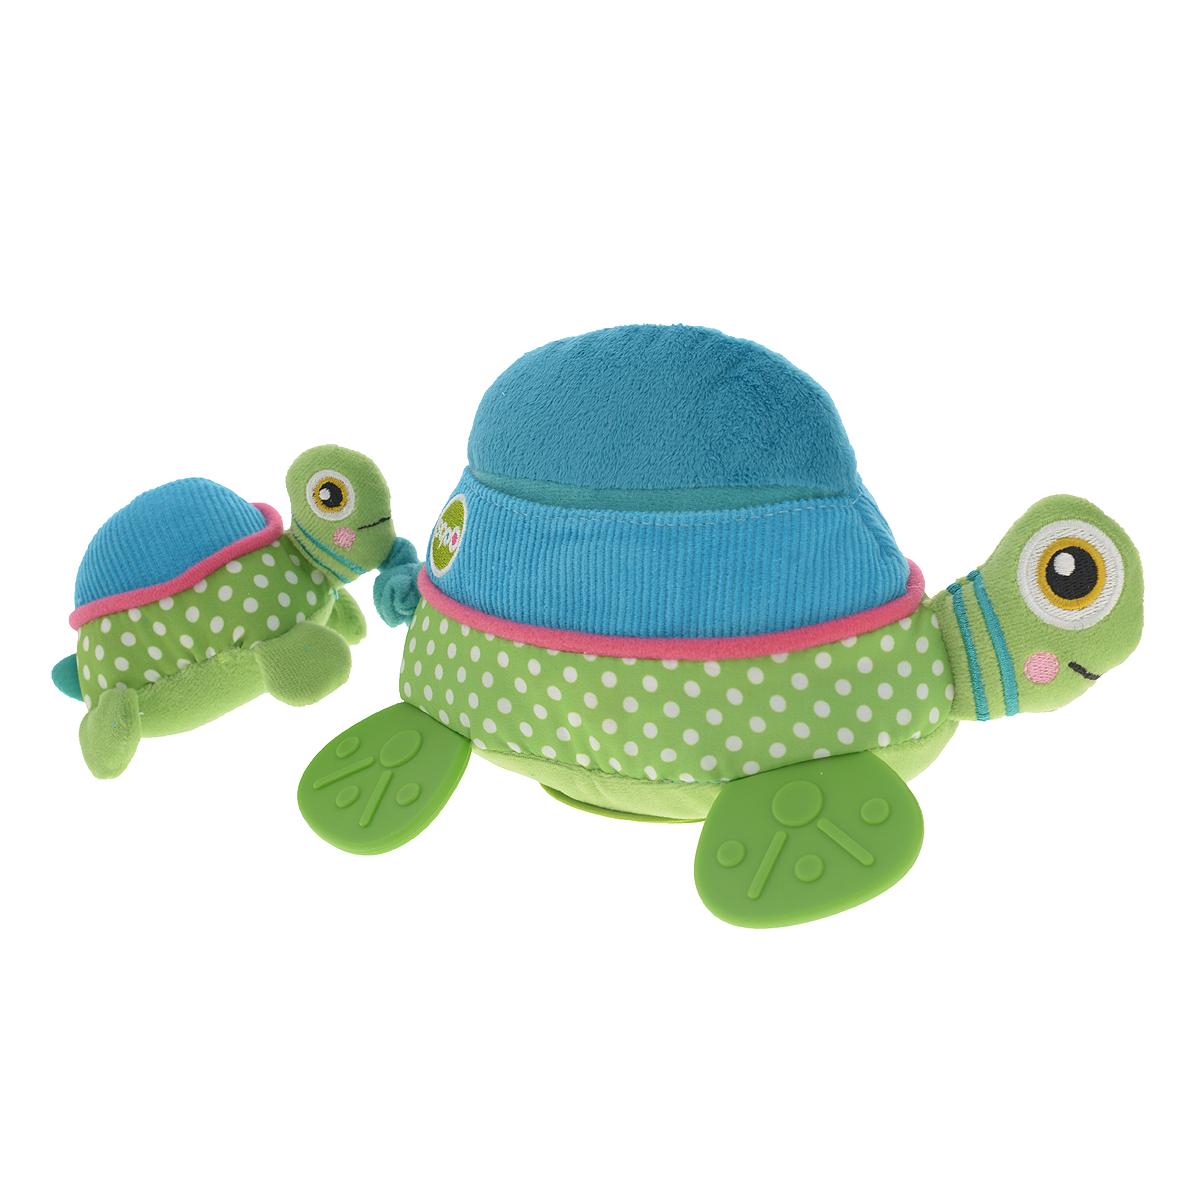 Игрушка развивающая OOPS Черепаха мягкие игрушки oops игрушка развивающая черепаха